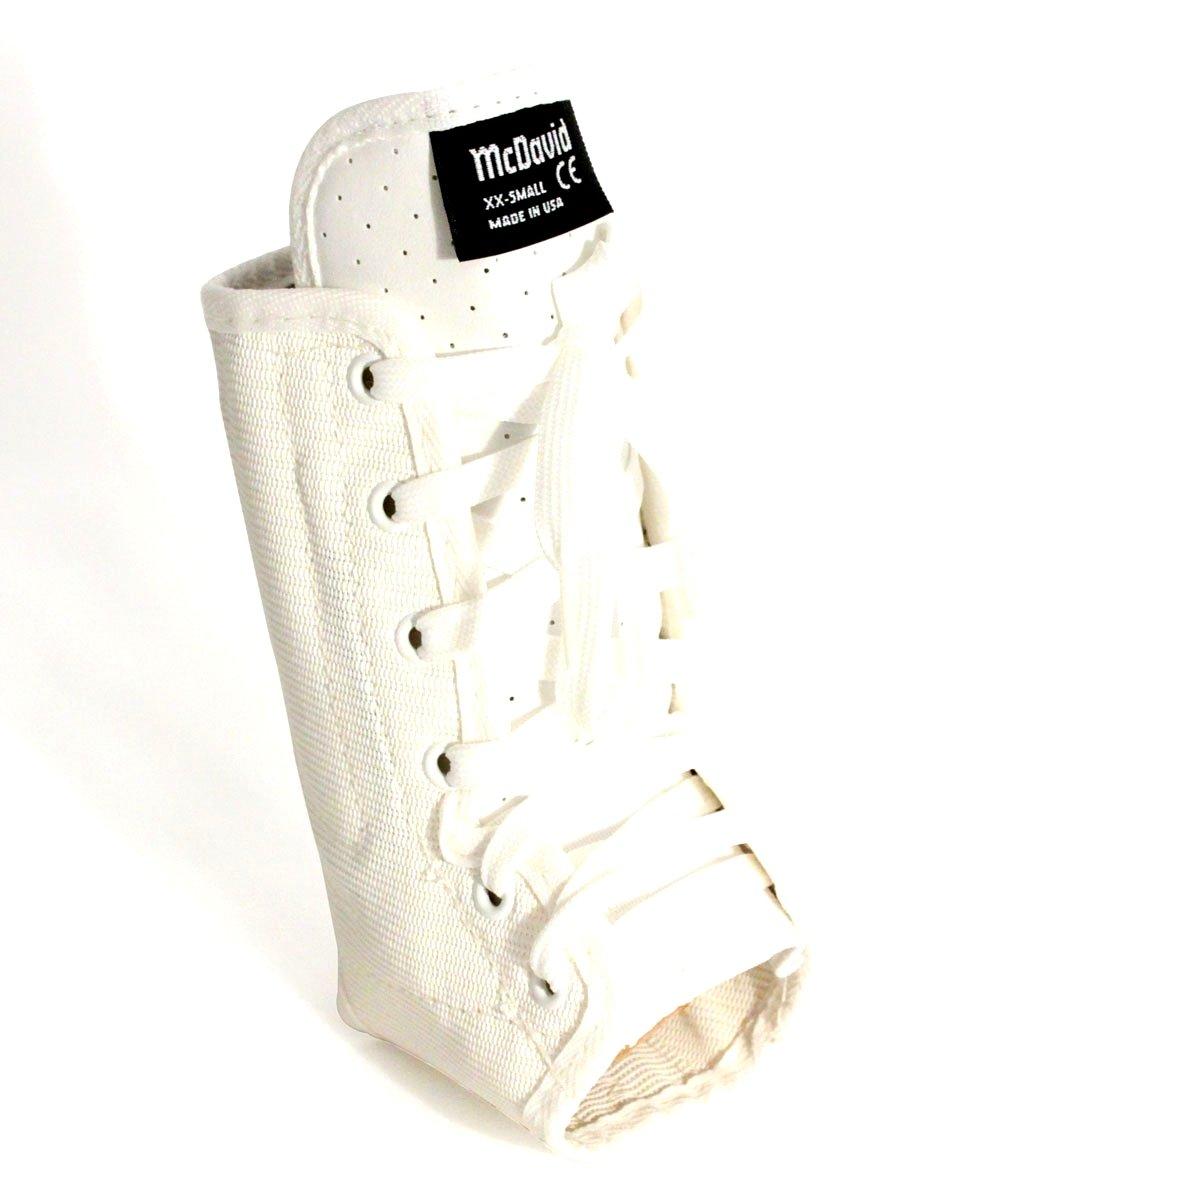 McDavid 199 Lightweight Ankle Brace (White, Small) by McDavid (Image #1)